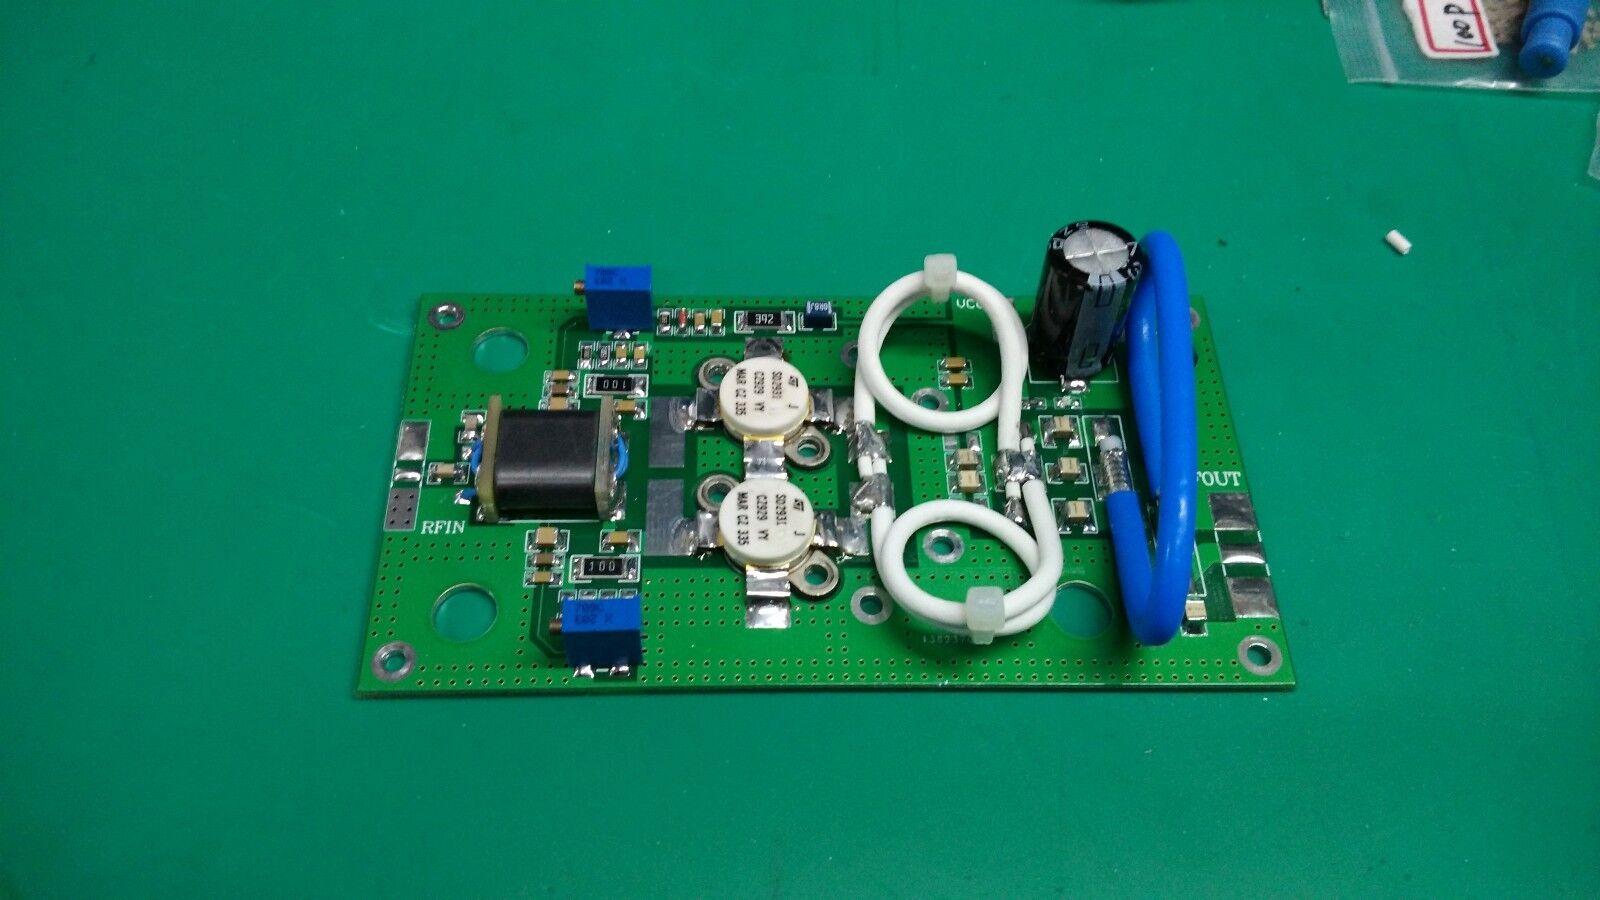 Assembled 88Mhz-108Mhz 300W FM transmitter power amplifier module